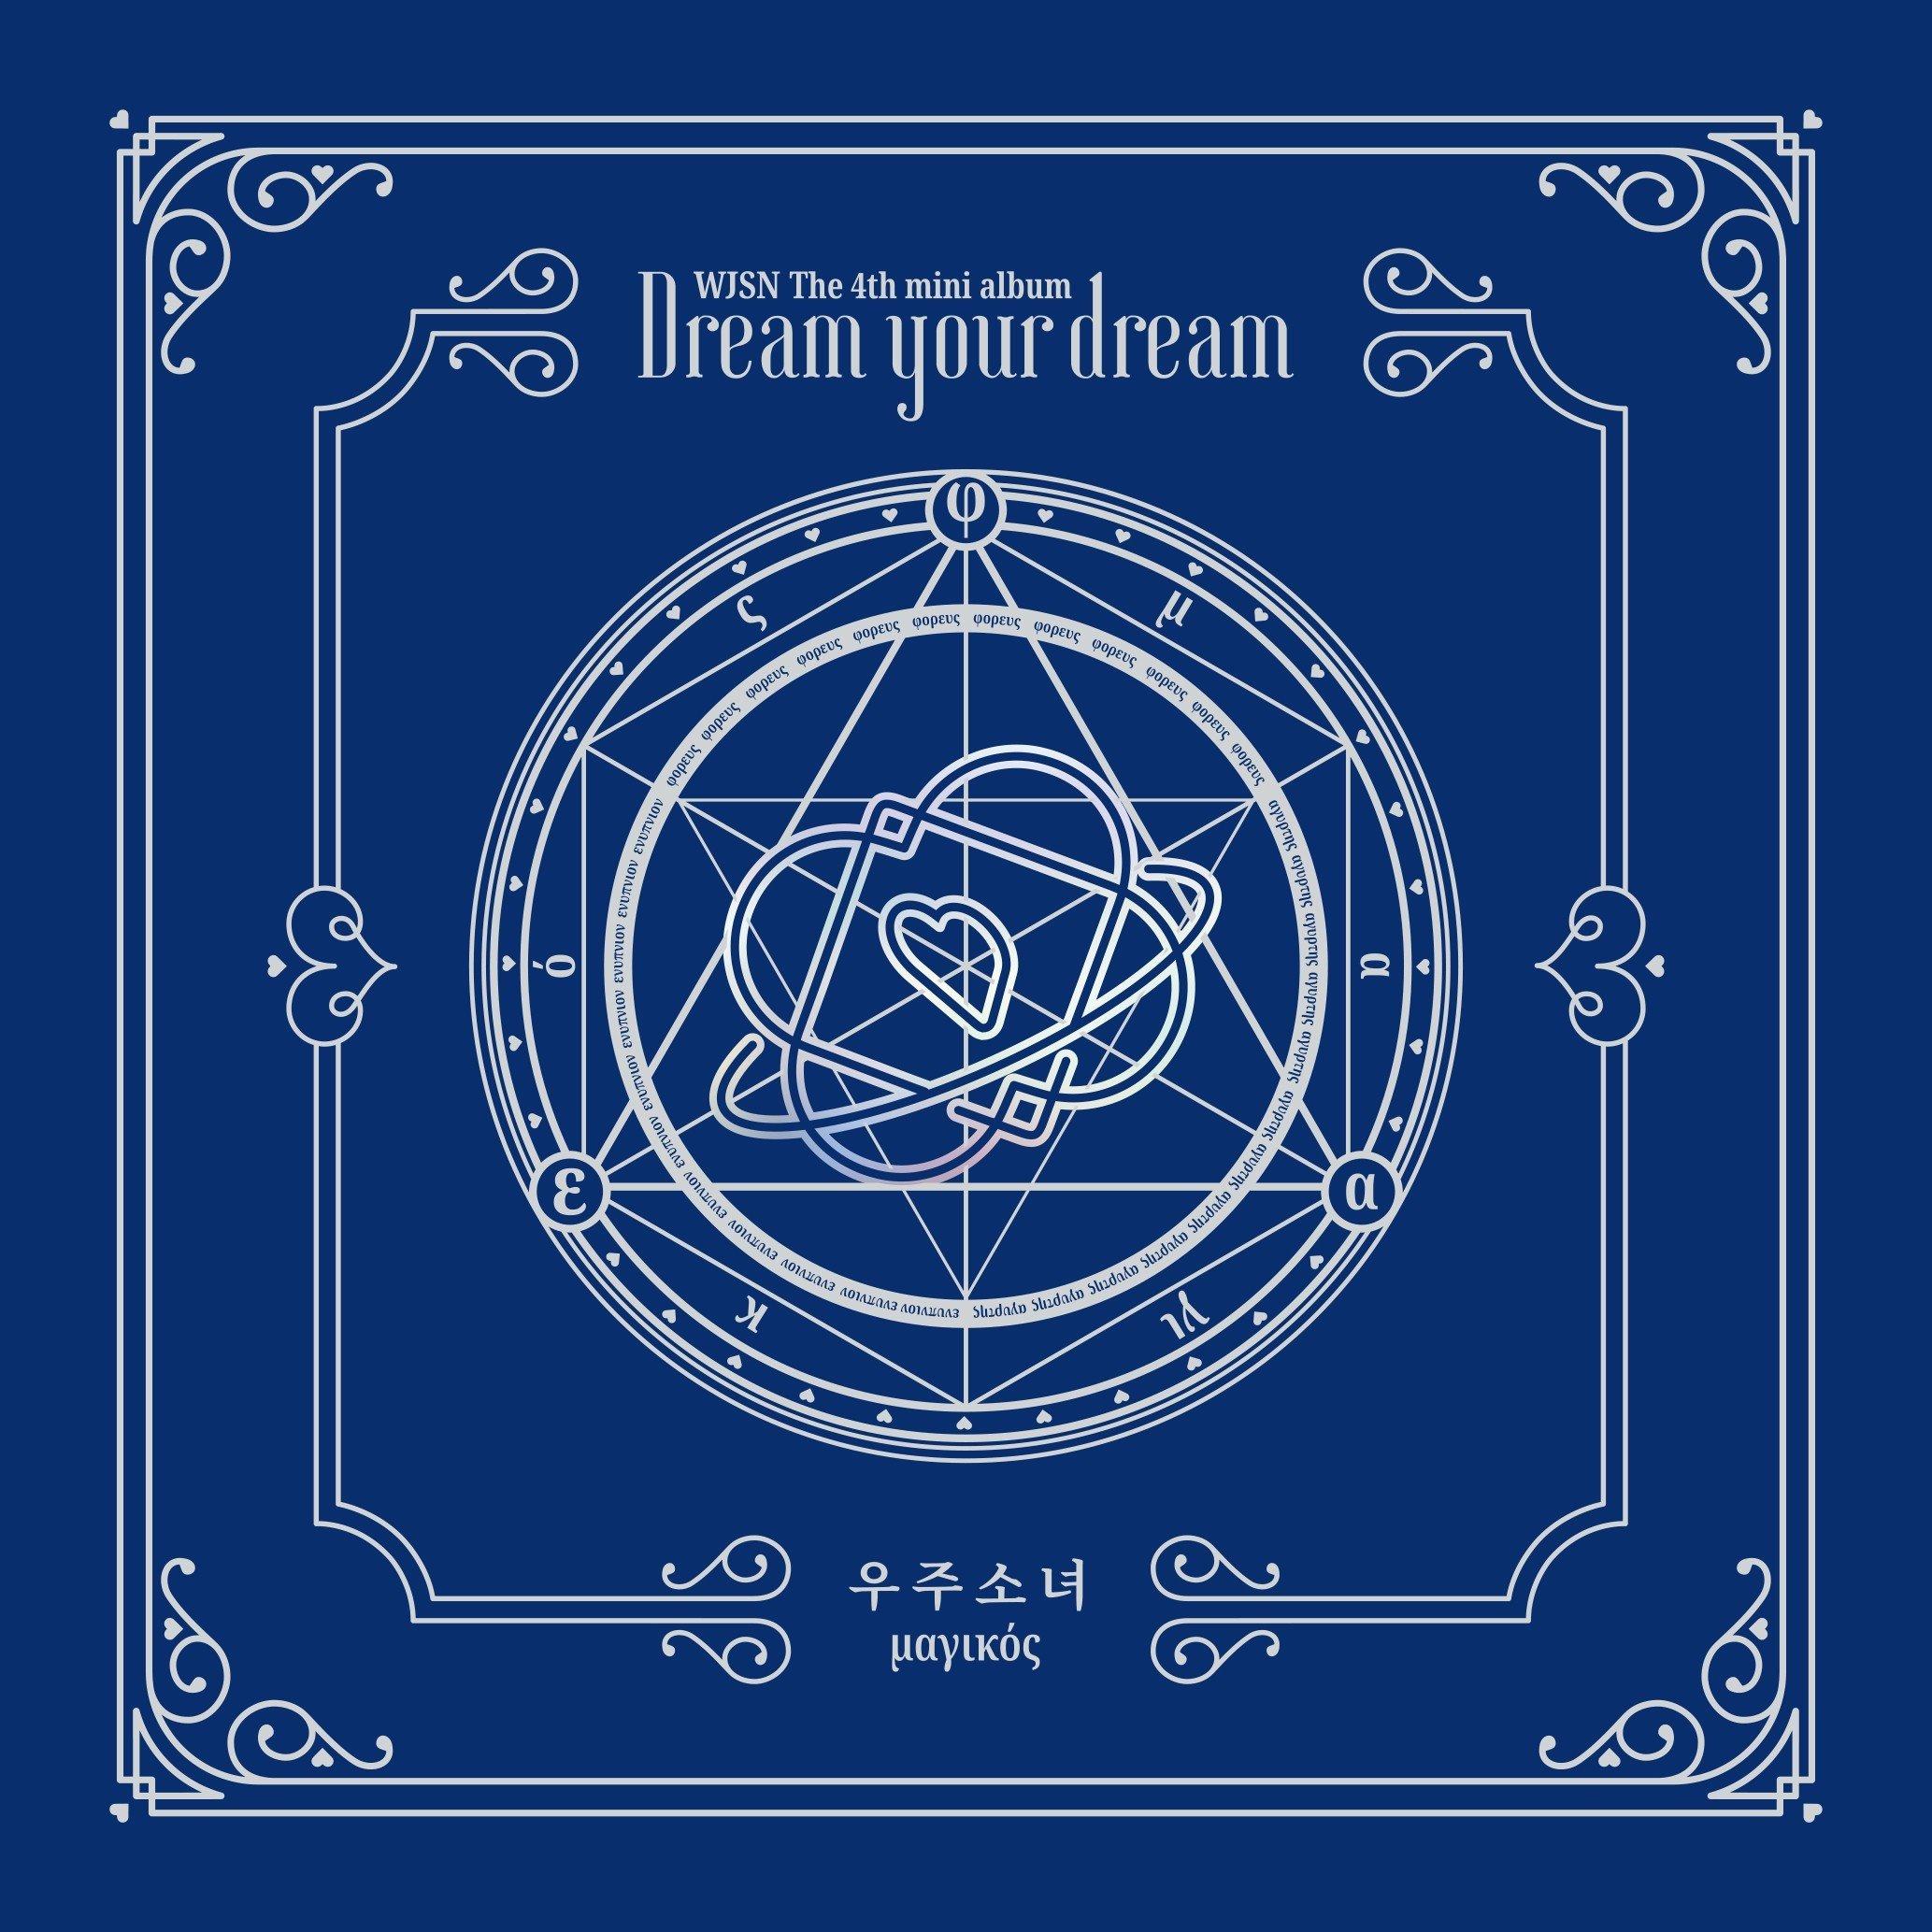 [Single] WJSN (우주소녀) – Dream Your Dream [FLAC / 24bit Lossless / WEB] [2018.02.27]